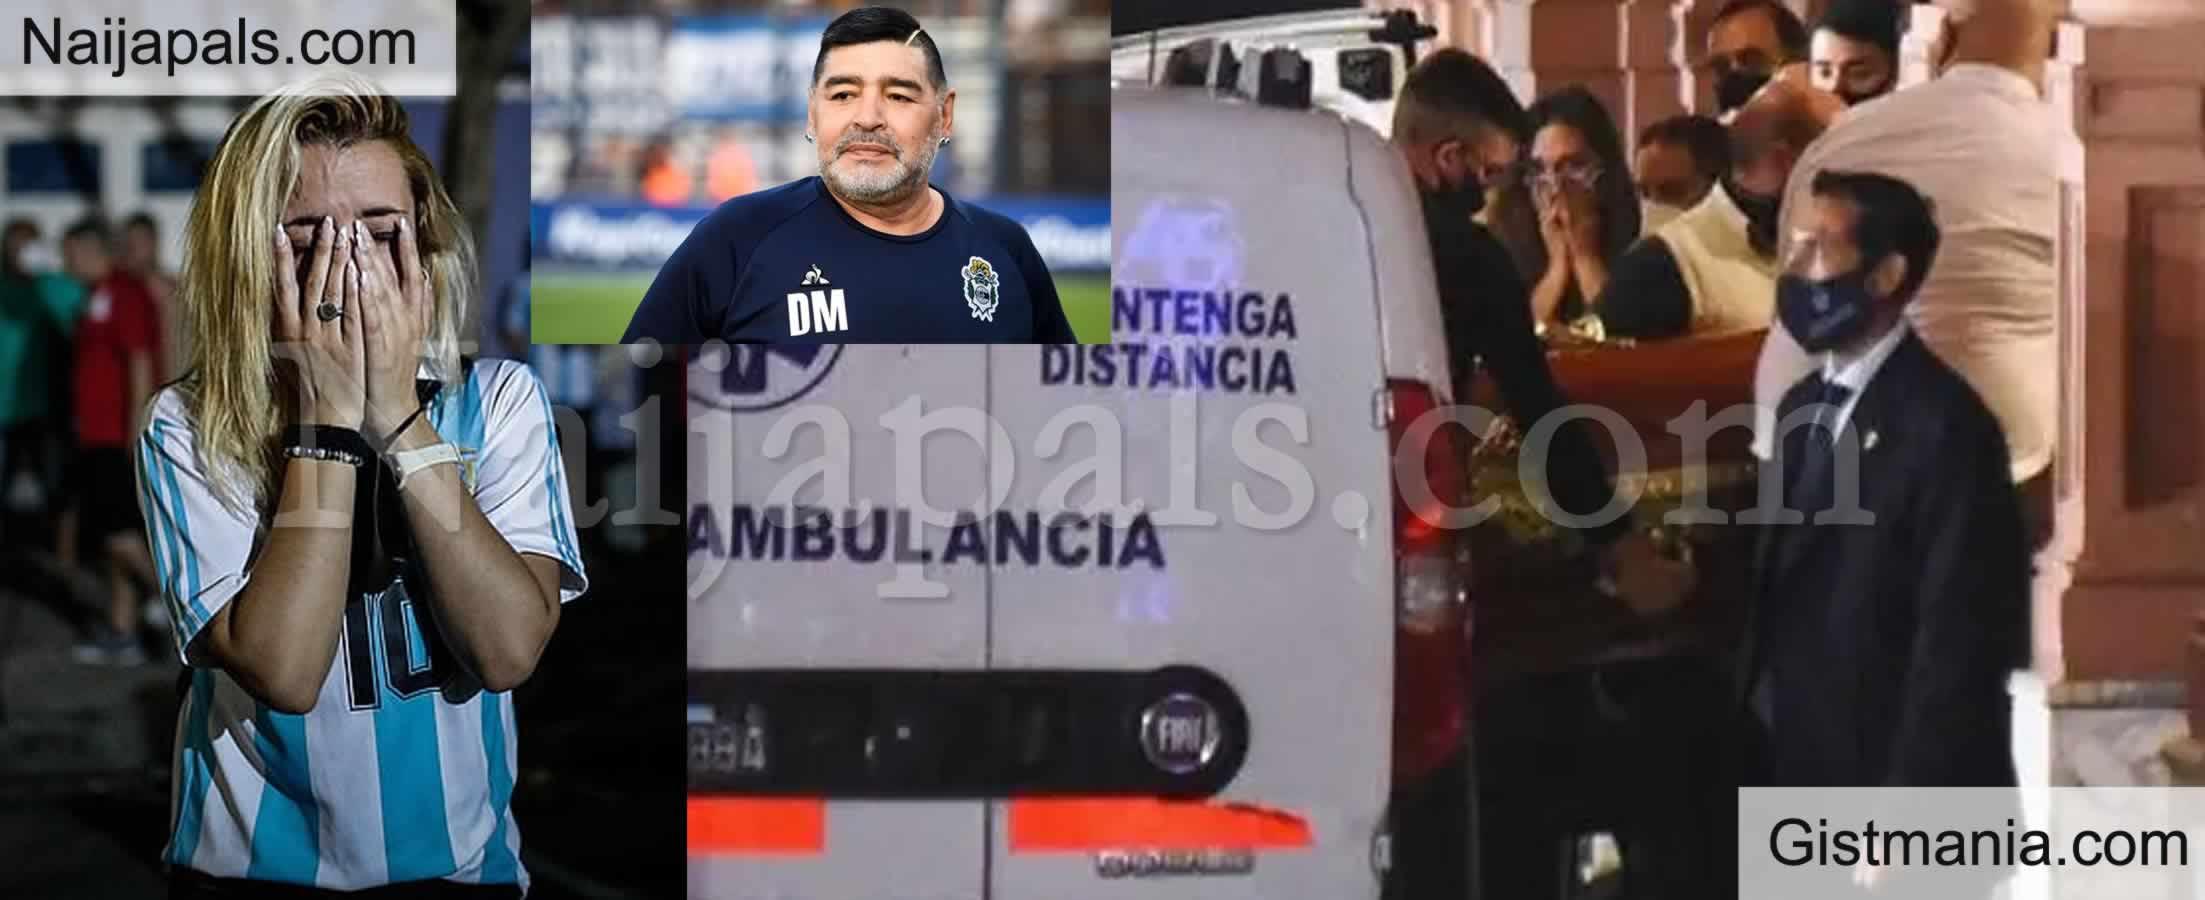 <img alt='.' class='lazyload' data-src='https://img.gistmania.com/emot/cry.gif' /> Weeping Crowd Gather As <b>Diego Maradona Body Arrives Argentinian President's Mansion</b> (Photos)